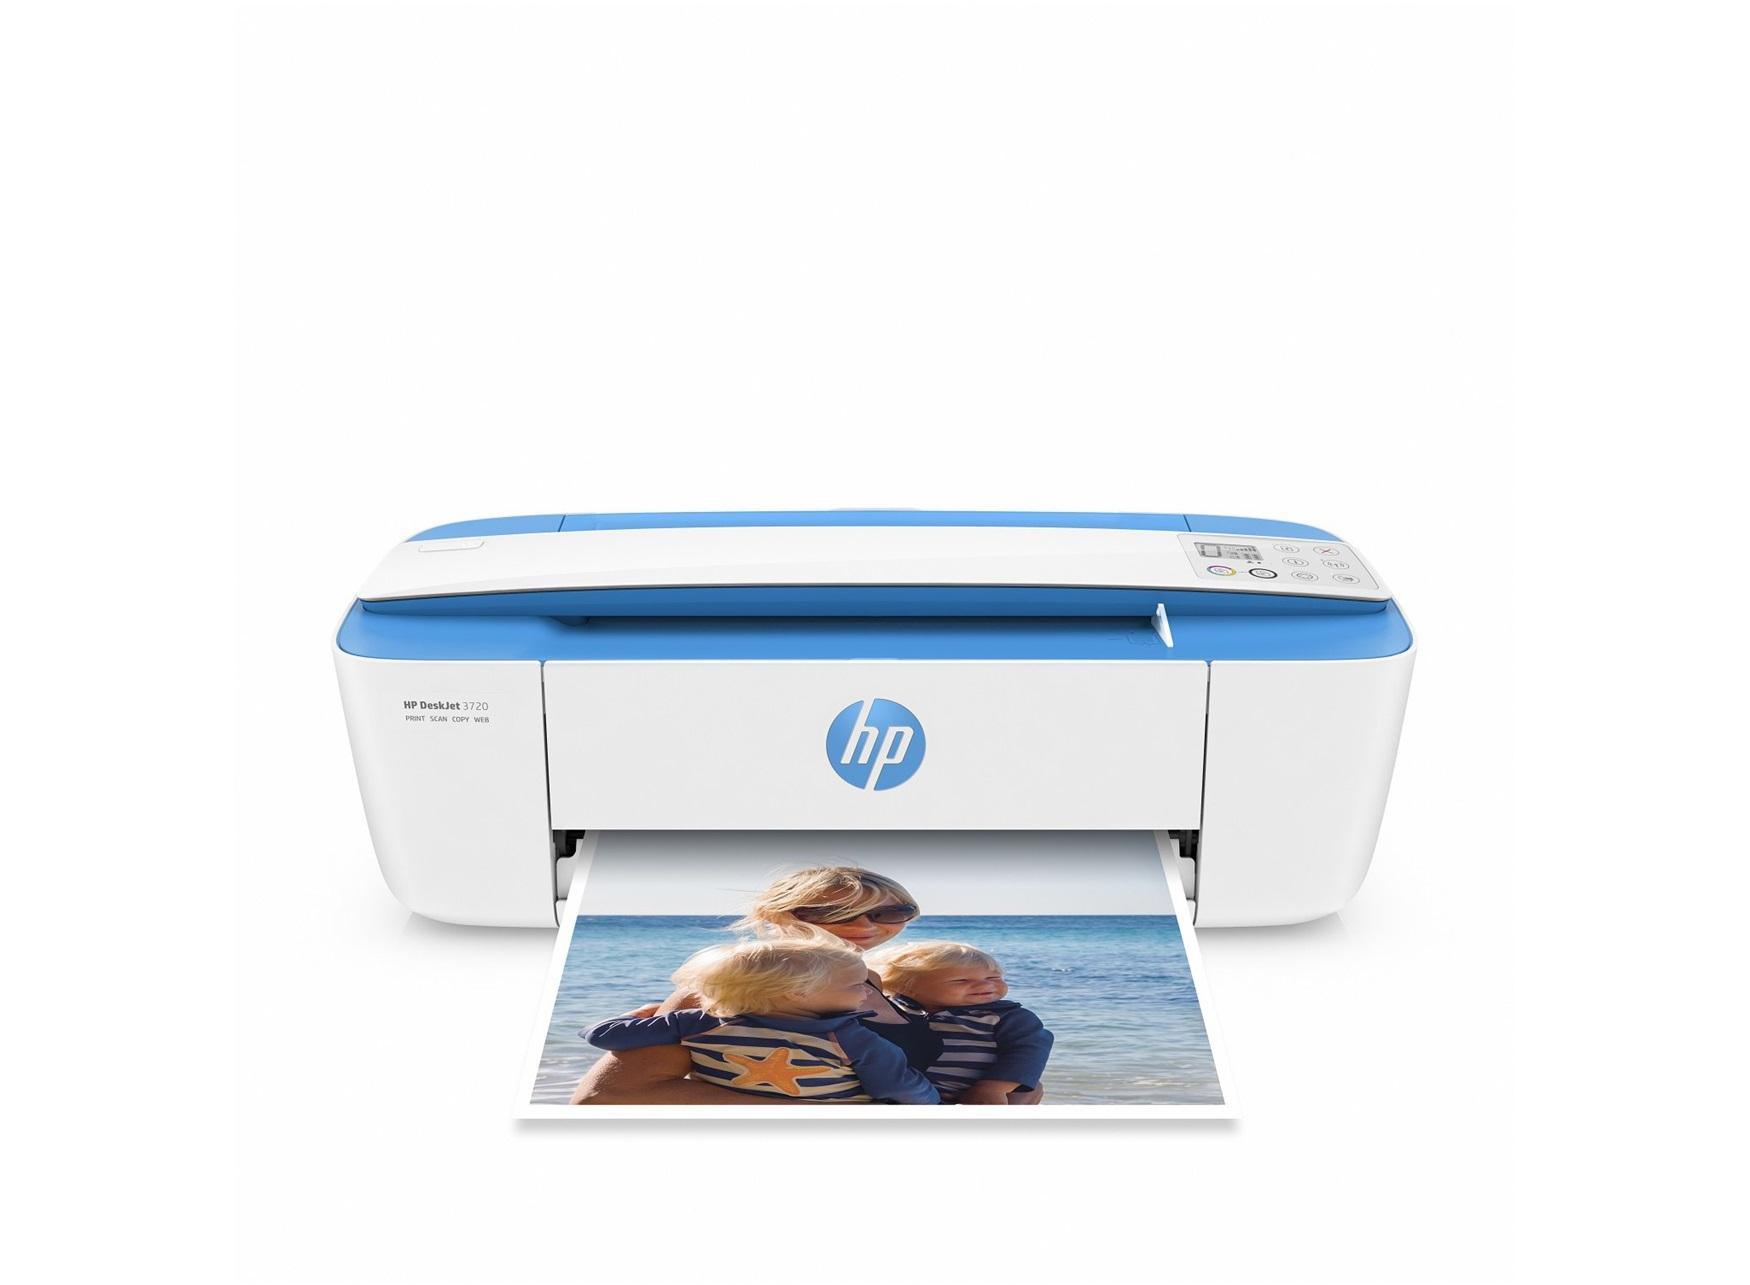 HP DeskJet 3720 AiO 4800 x 1200DPI Thermal Inkjet A4 8ppm Wi-Fi Blue,White